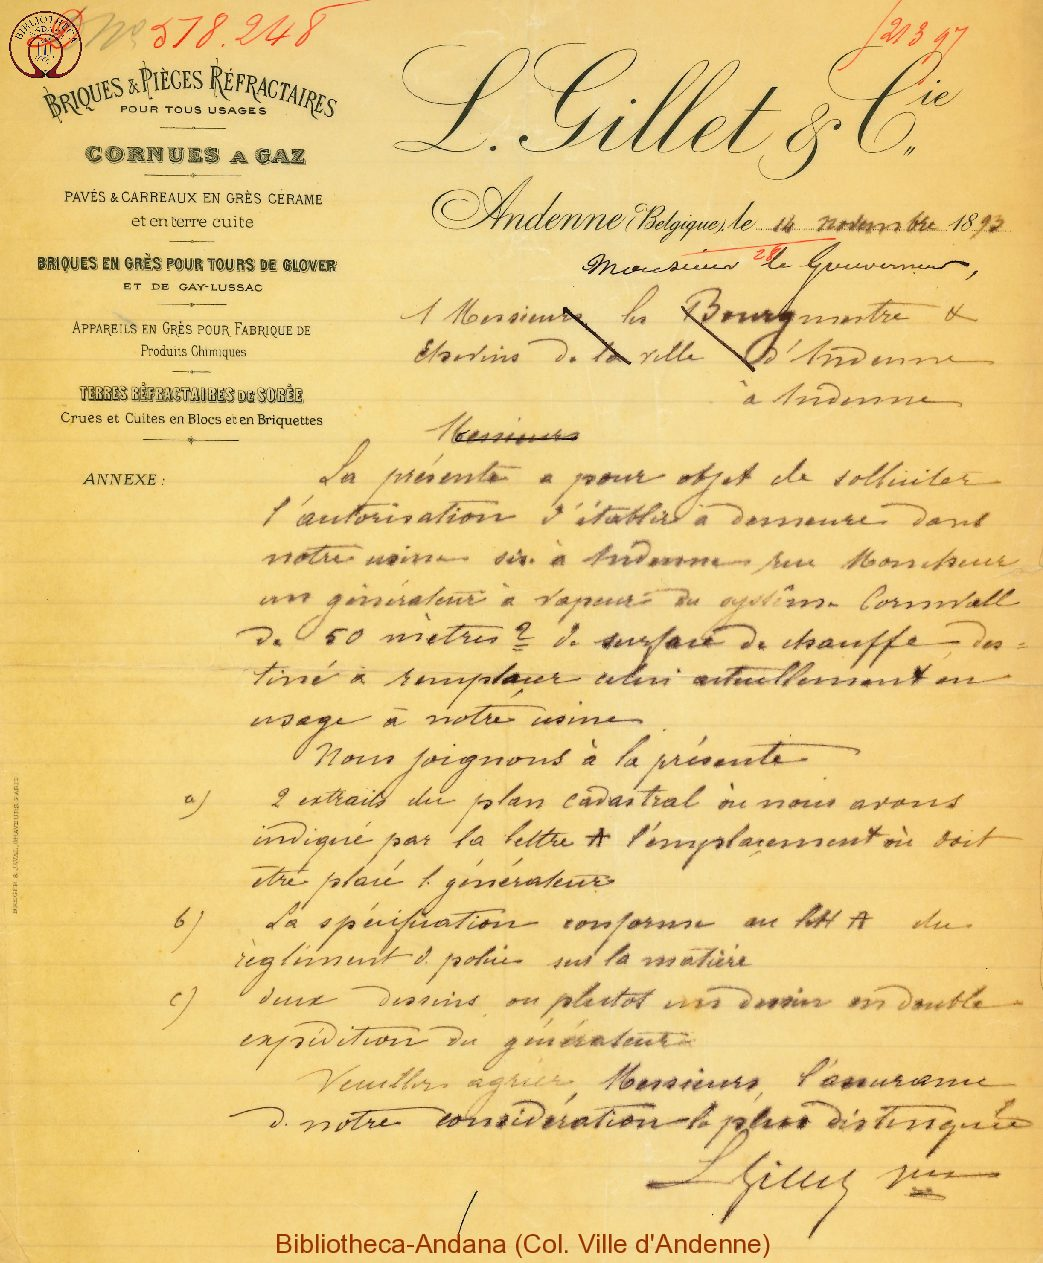 1893-11-14